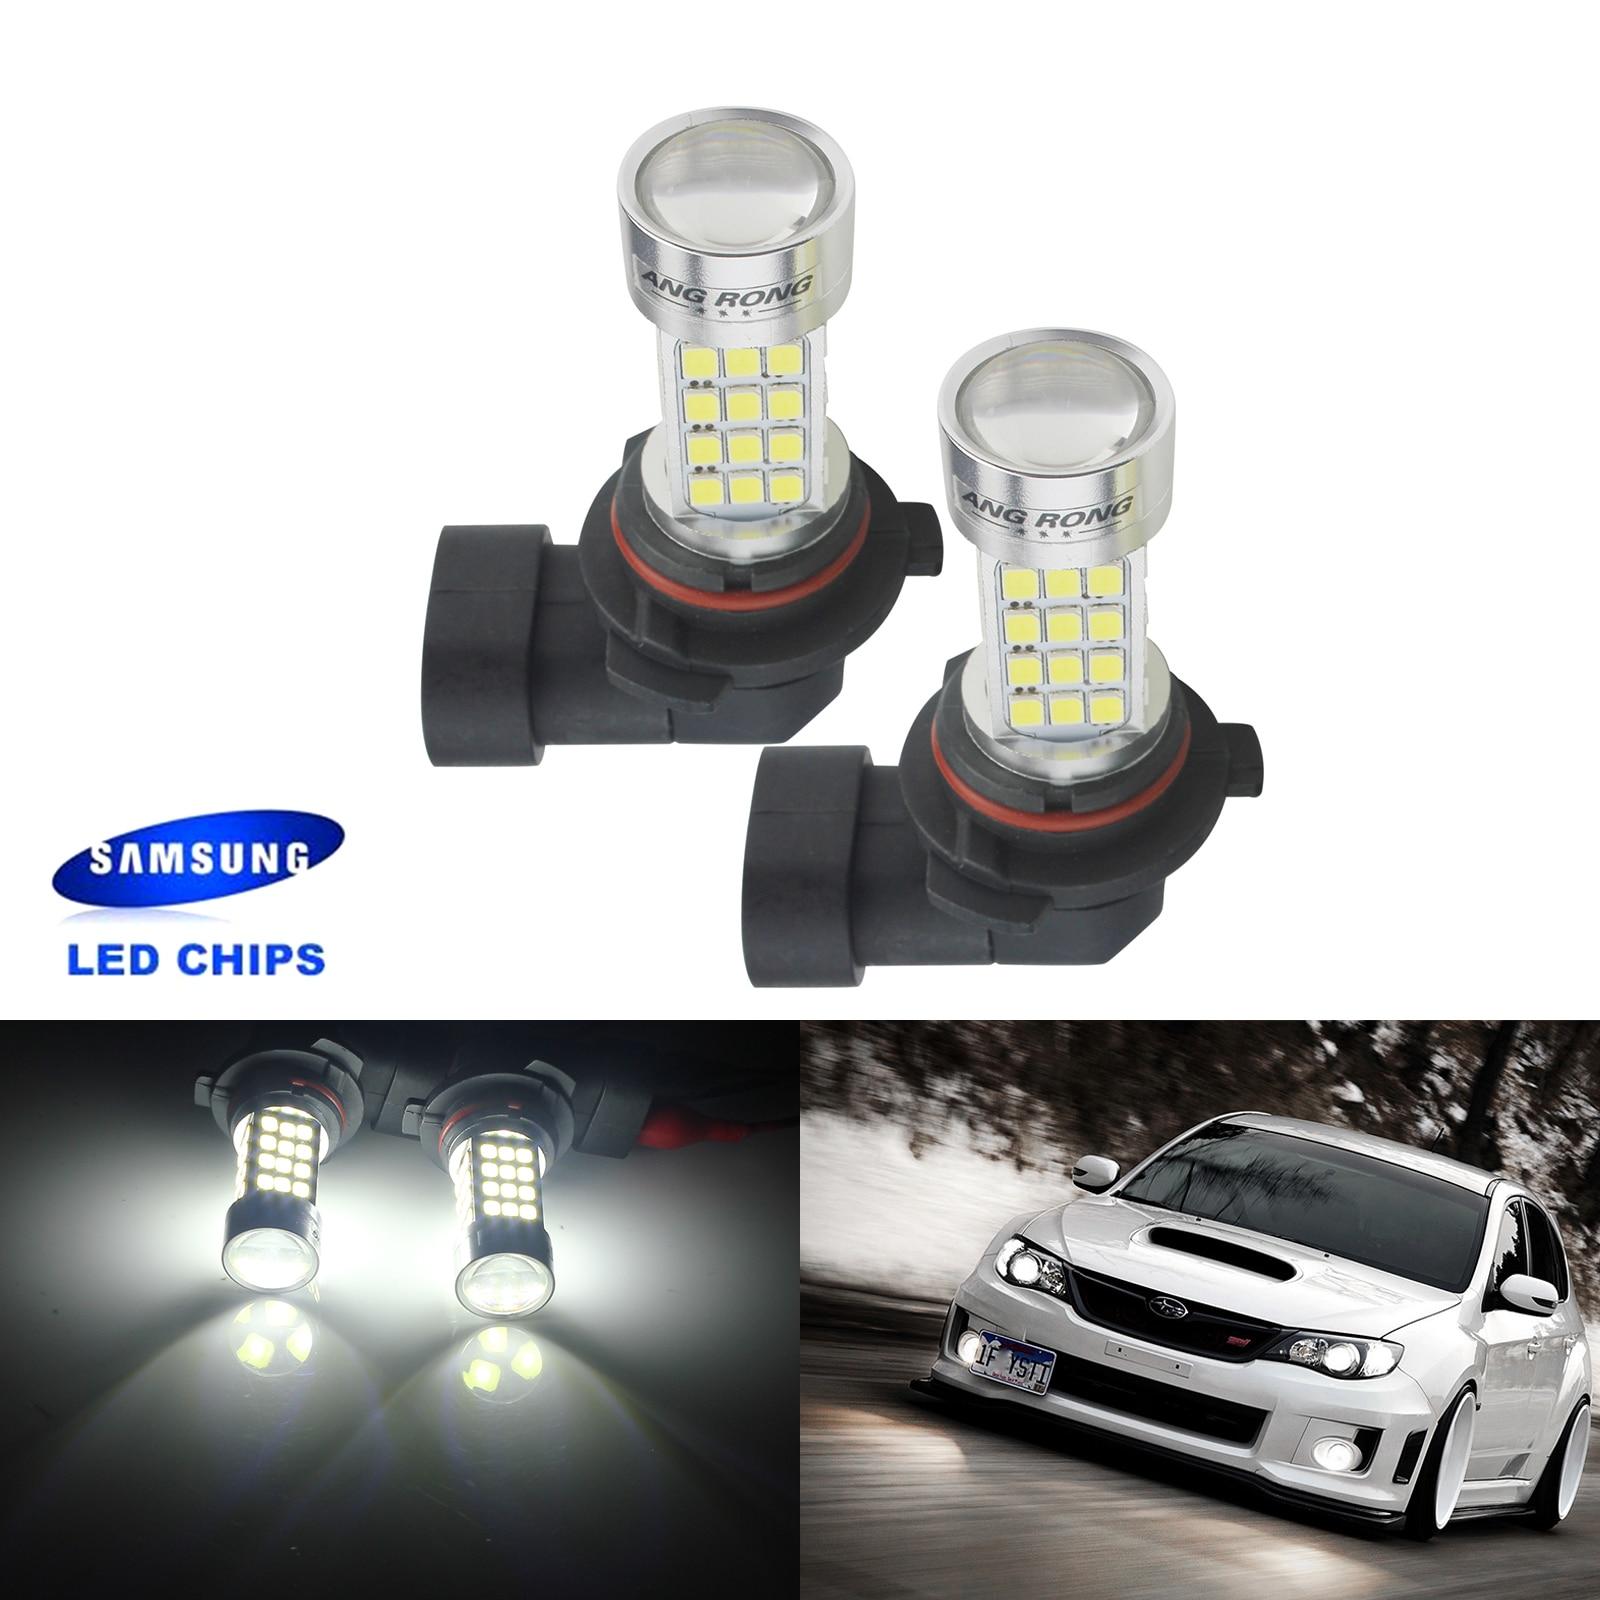 2x White HB4 9006 Led Bulbs High Power 50W Fog Driving Light DRL Lamp Bulb